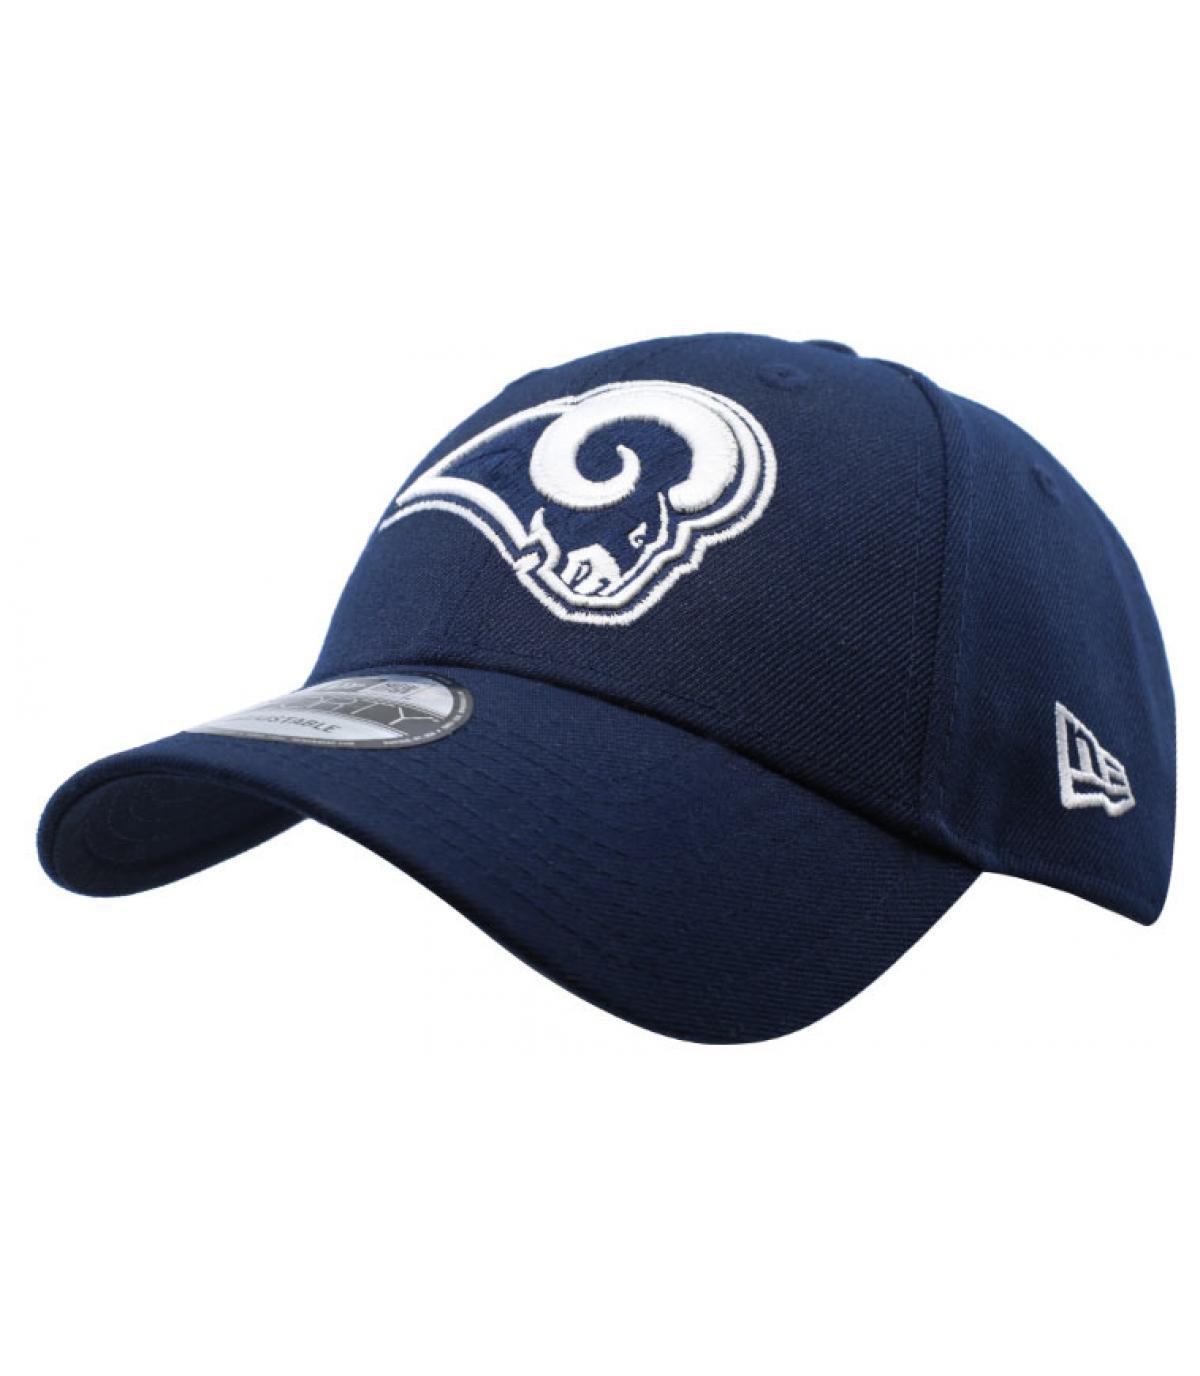 fa73c3c2 blue Rams curve cap - NFL The League Rams Team by New Era. Headict